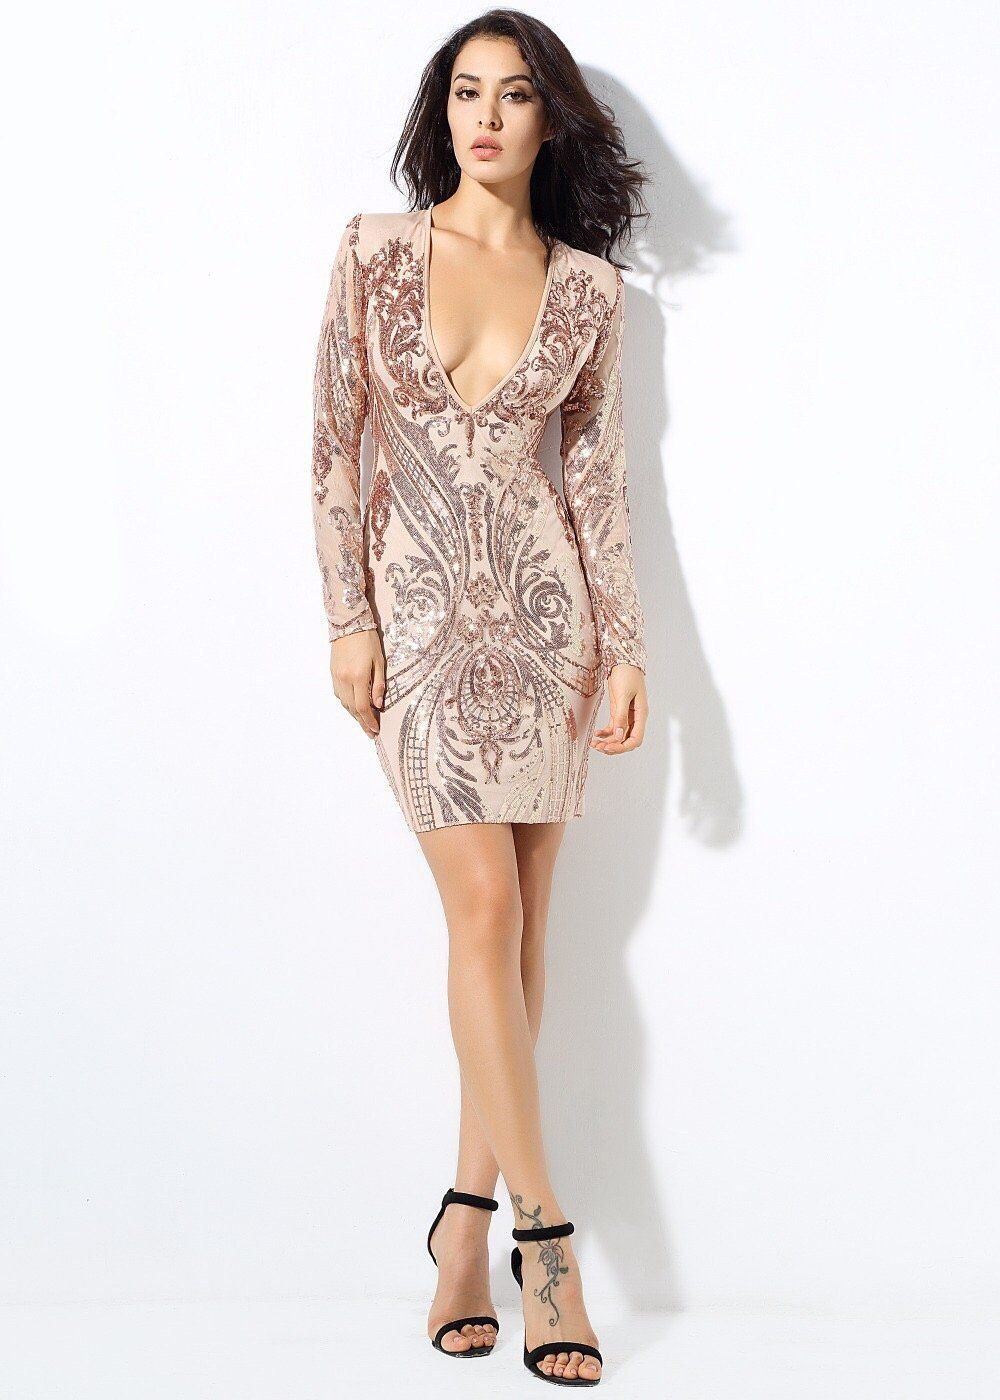 Honey crush rose gold sequin long sleeve mini dress with